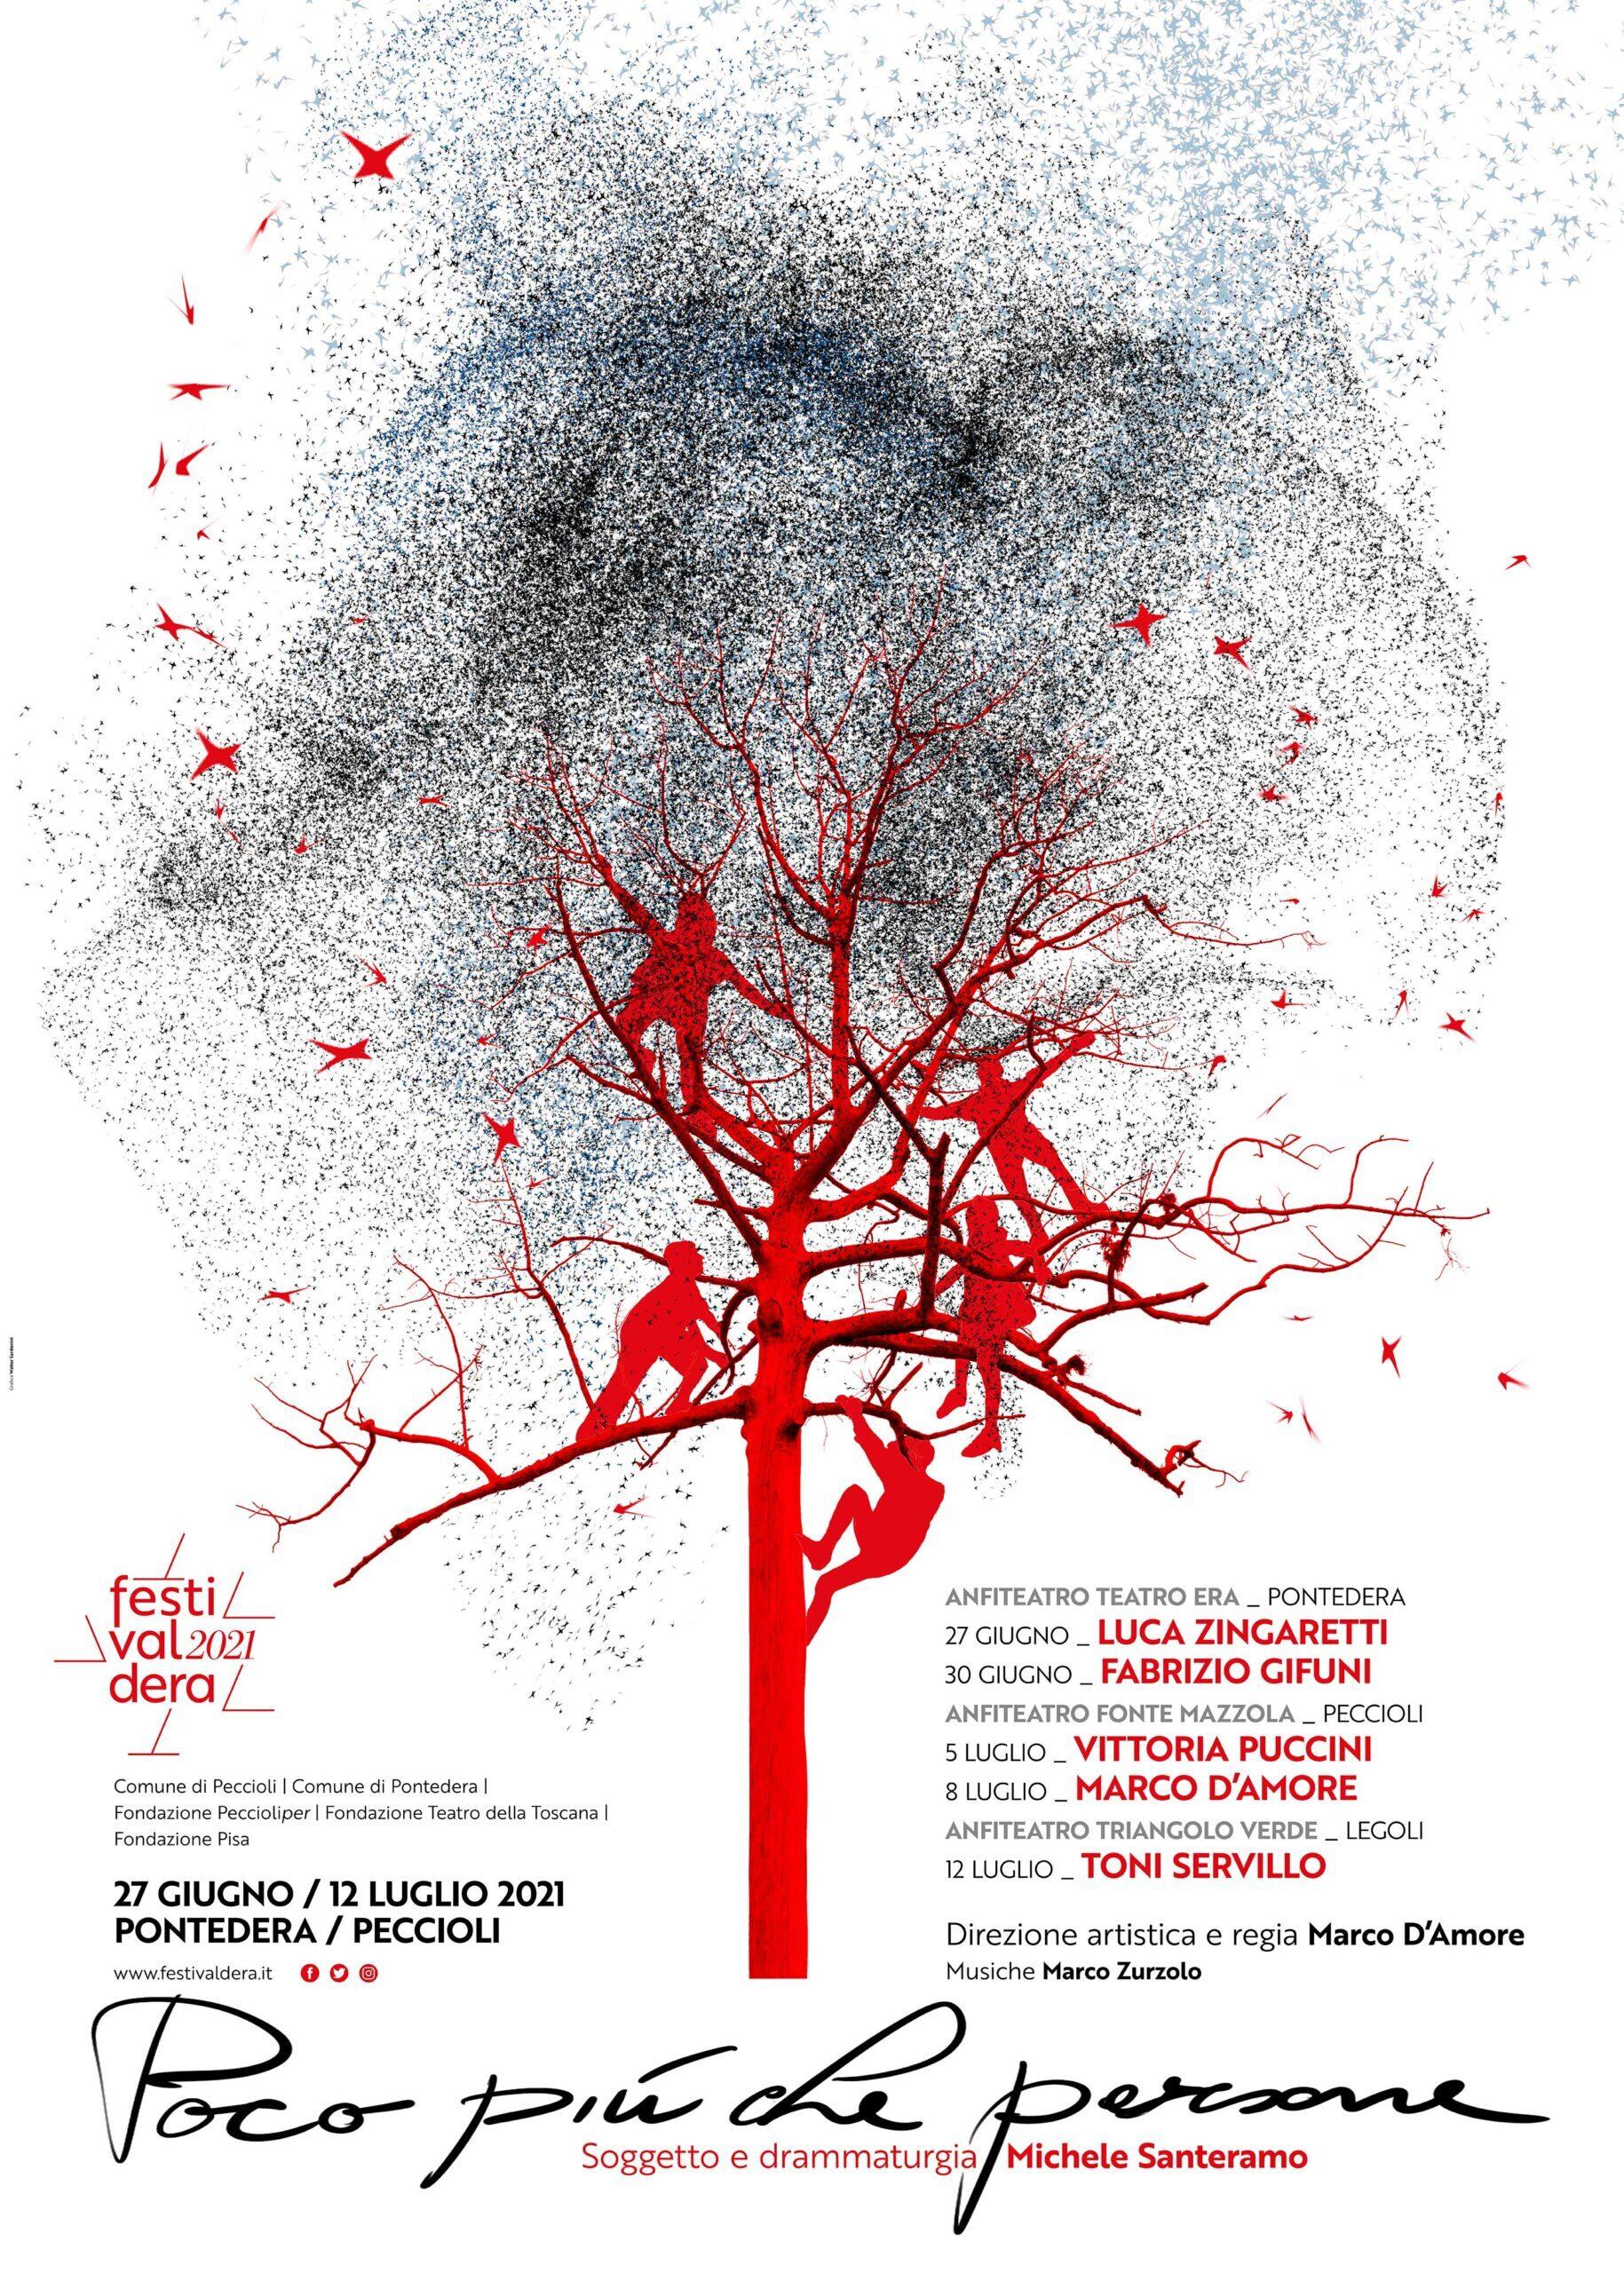 Festivaldera 2021 - Immagine Walter Sardonini